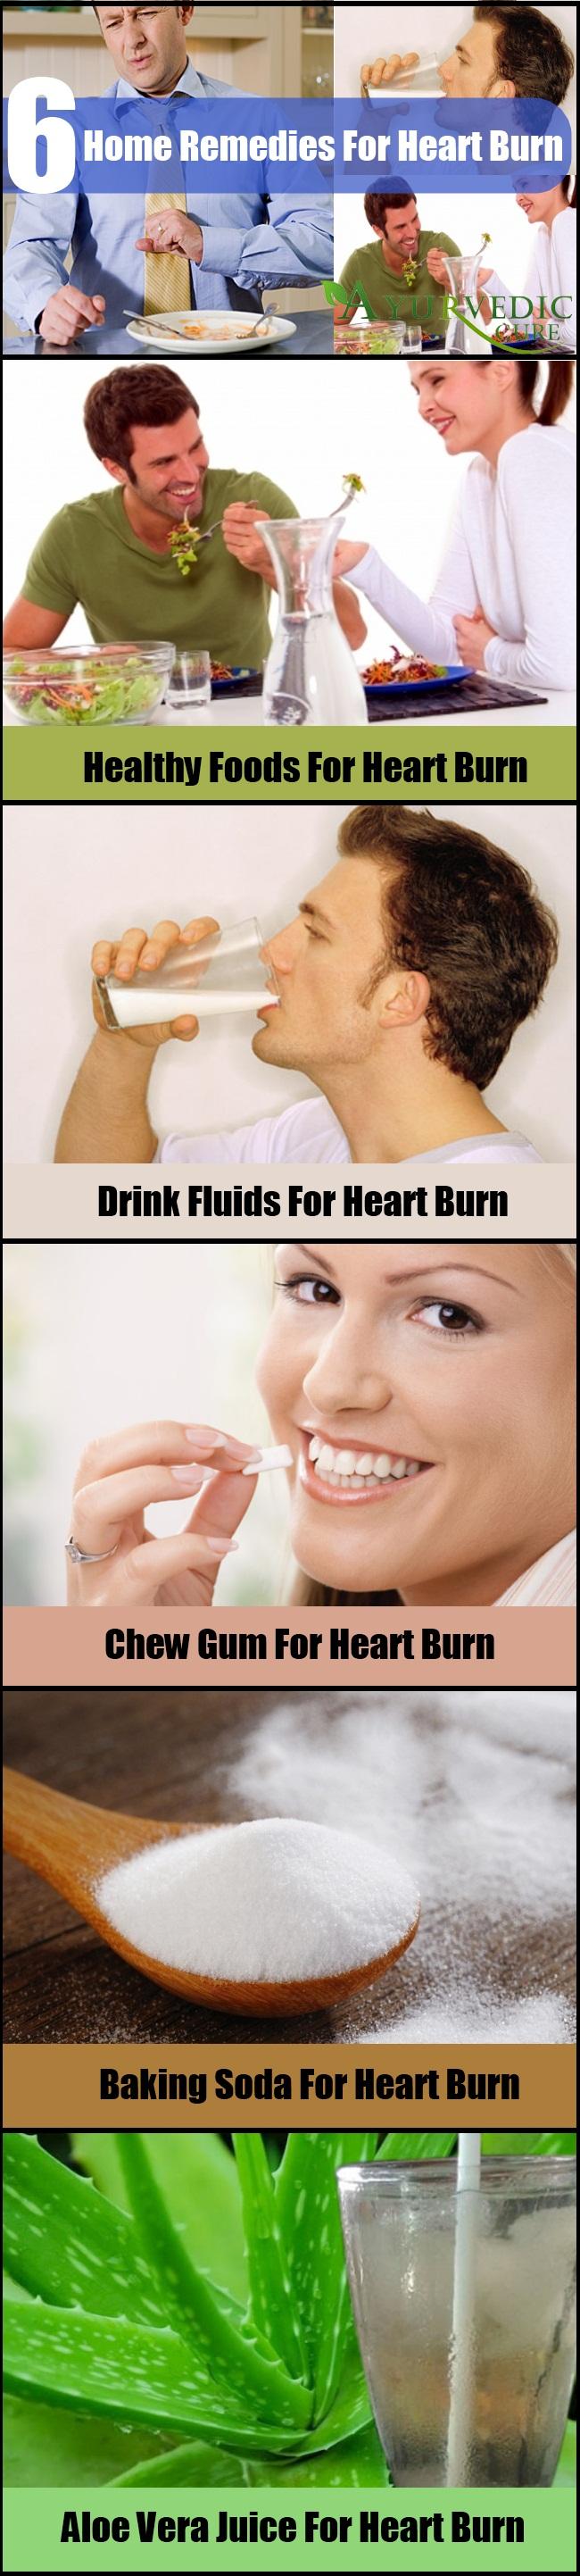 Remedies For Heart Burn